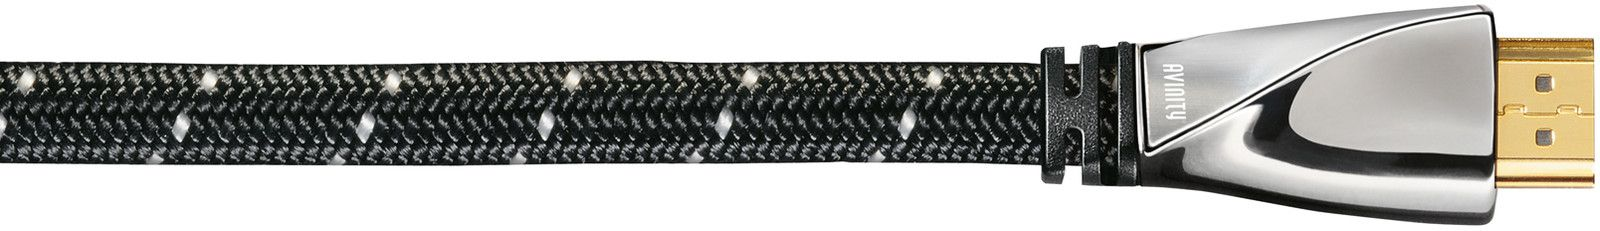 Avinity HDMI-kabel (klass 5) – 5m